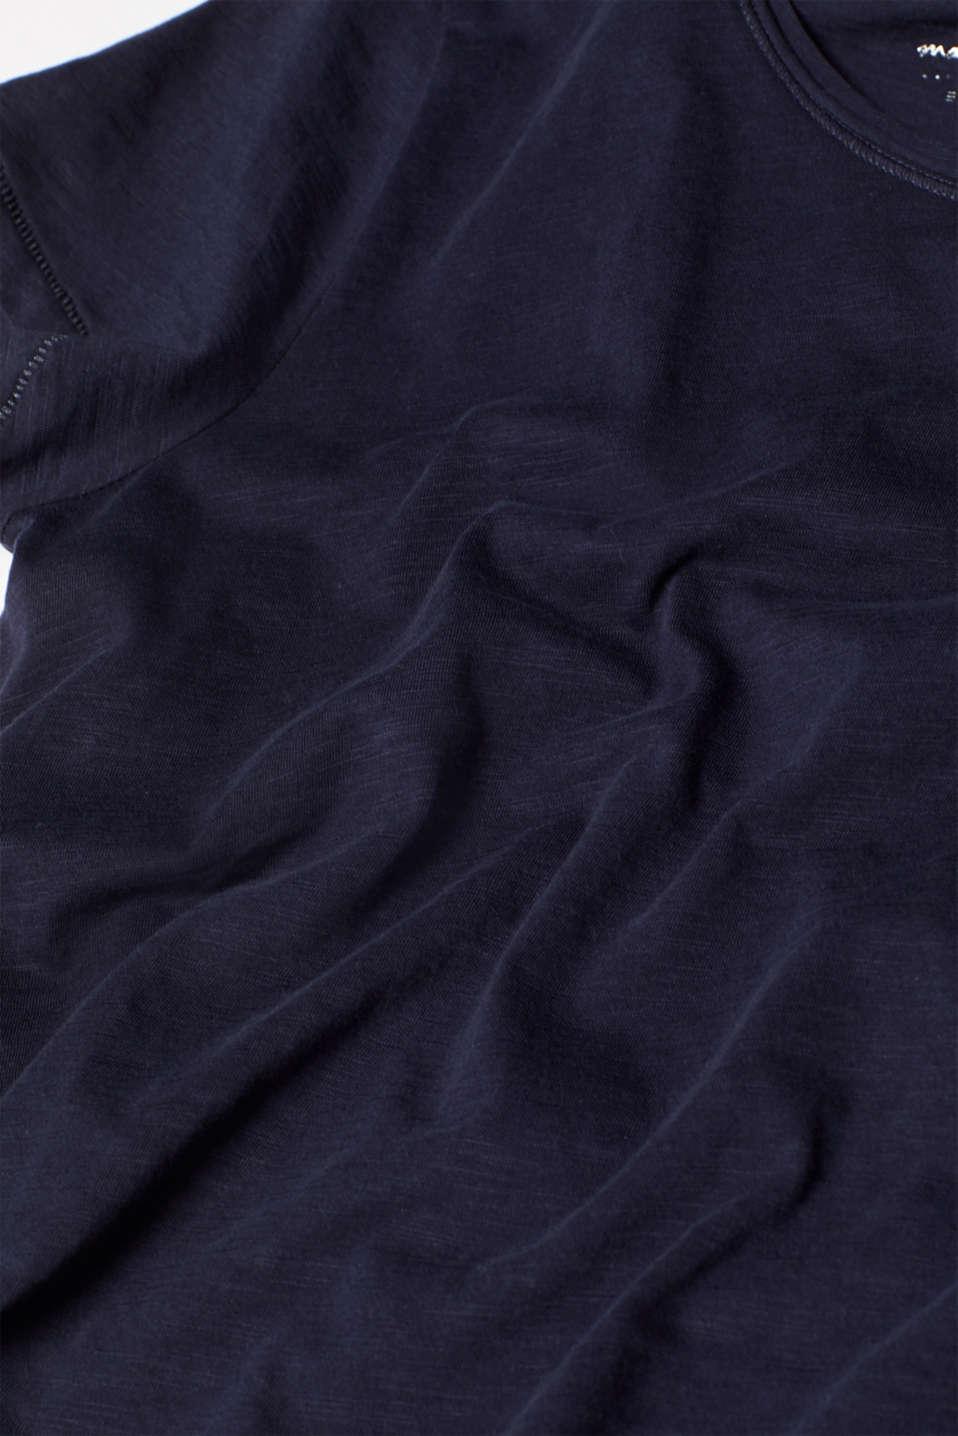 Slub jersey T-shirt in 100% cotton, NAVY, detail image number 4